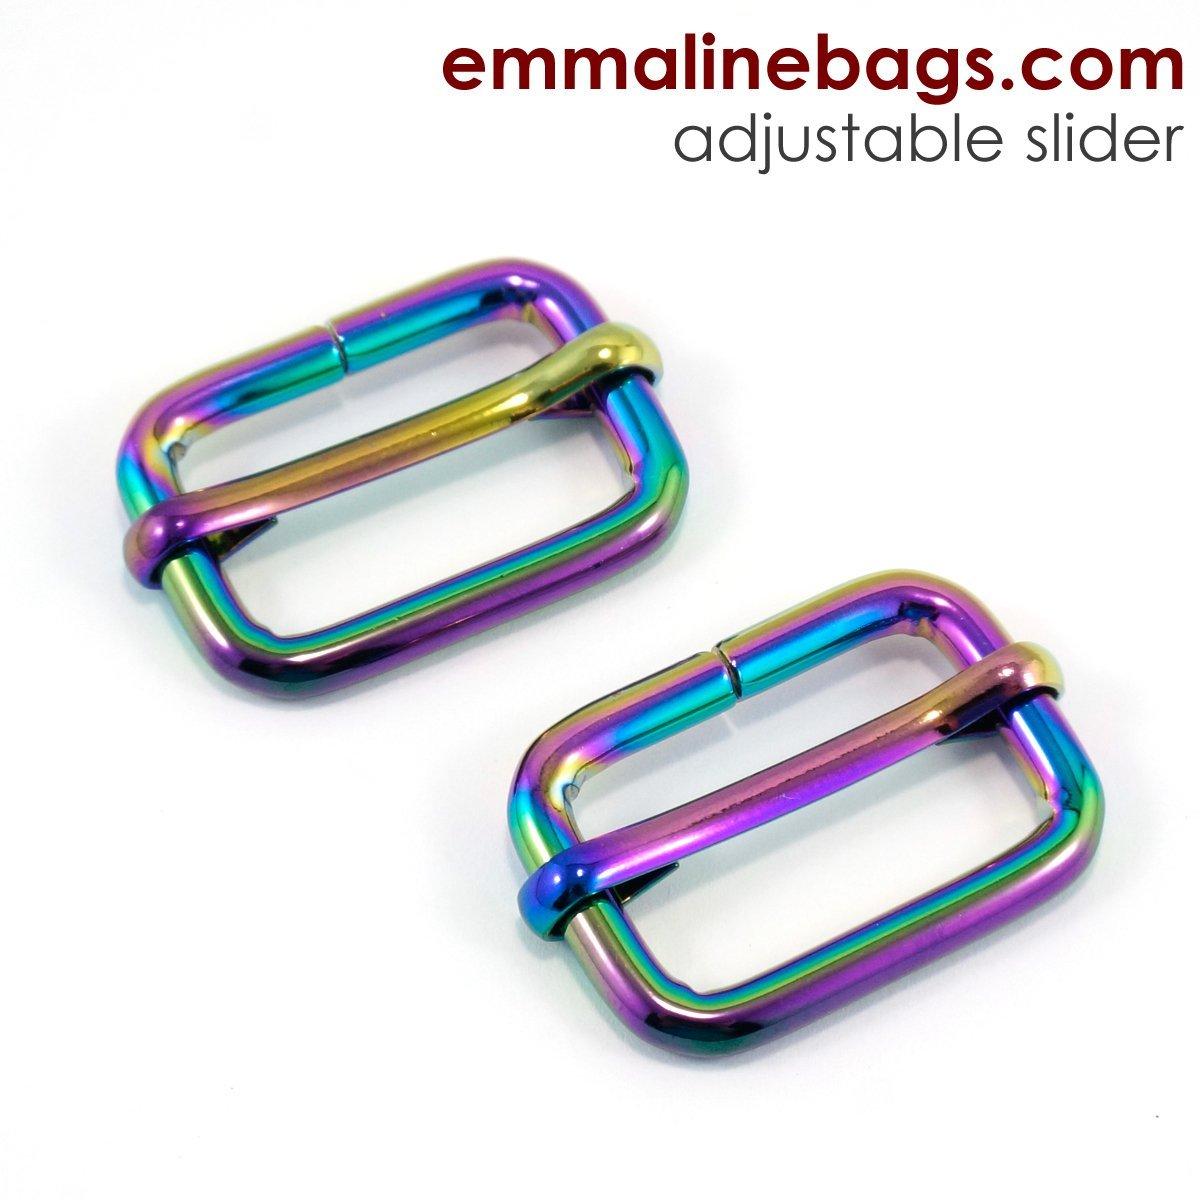 Emmaline Bags- Adjustable Sliders-1 inch (Iridescent Rainbow) 2 pack